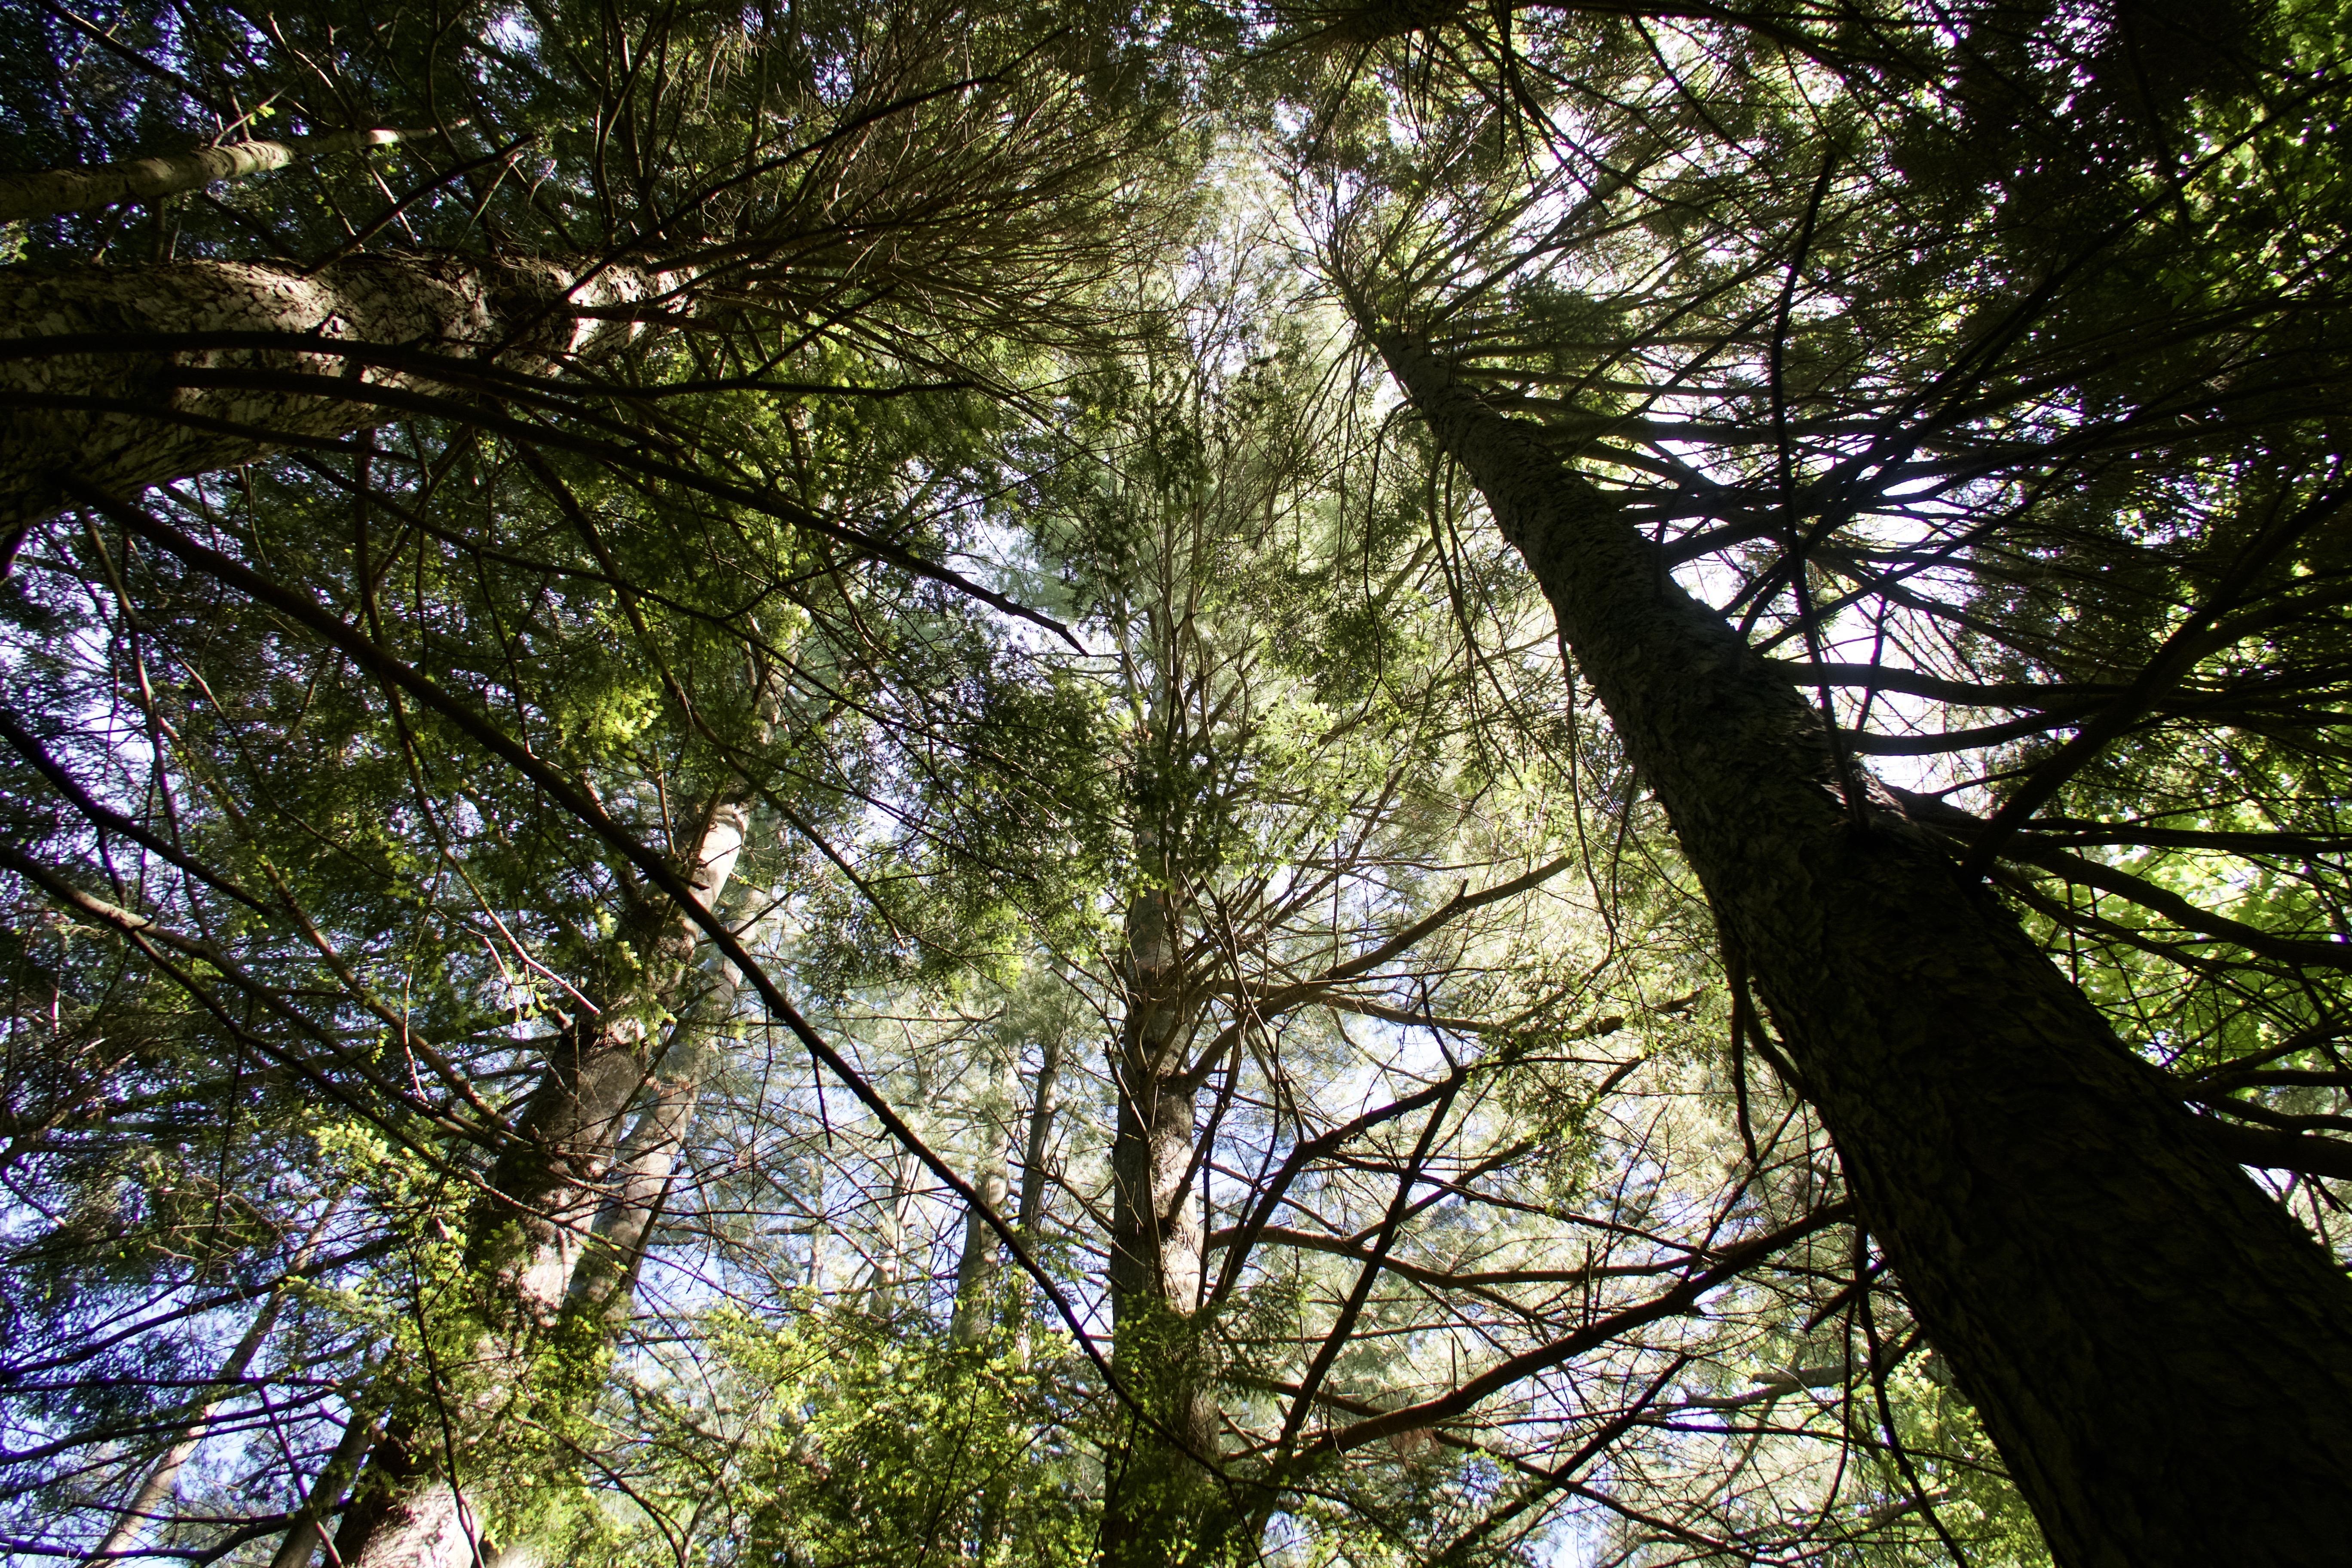 FEMC - Dataset -Tree Health Measurements - Overview